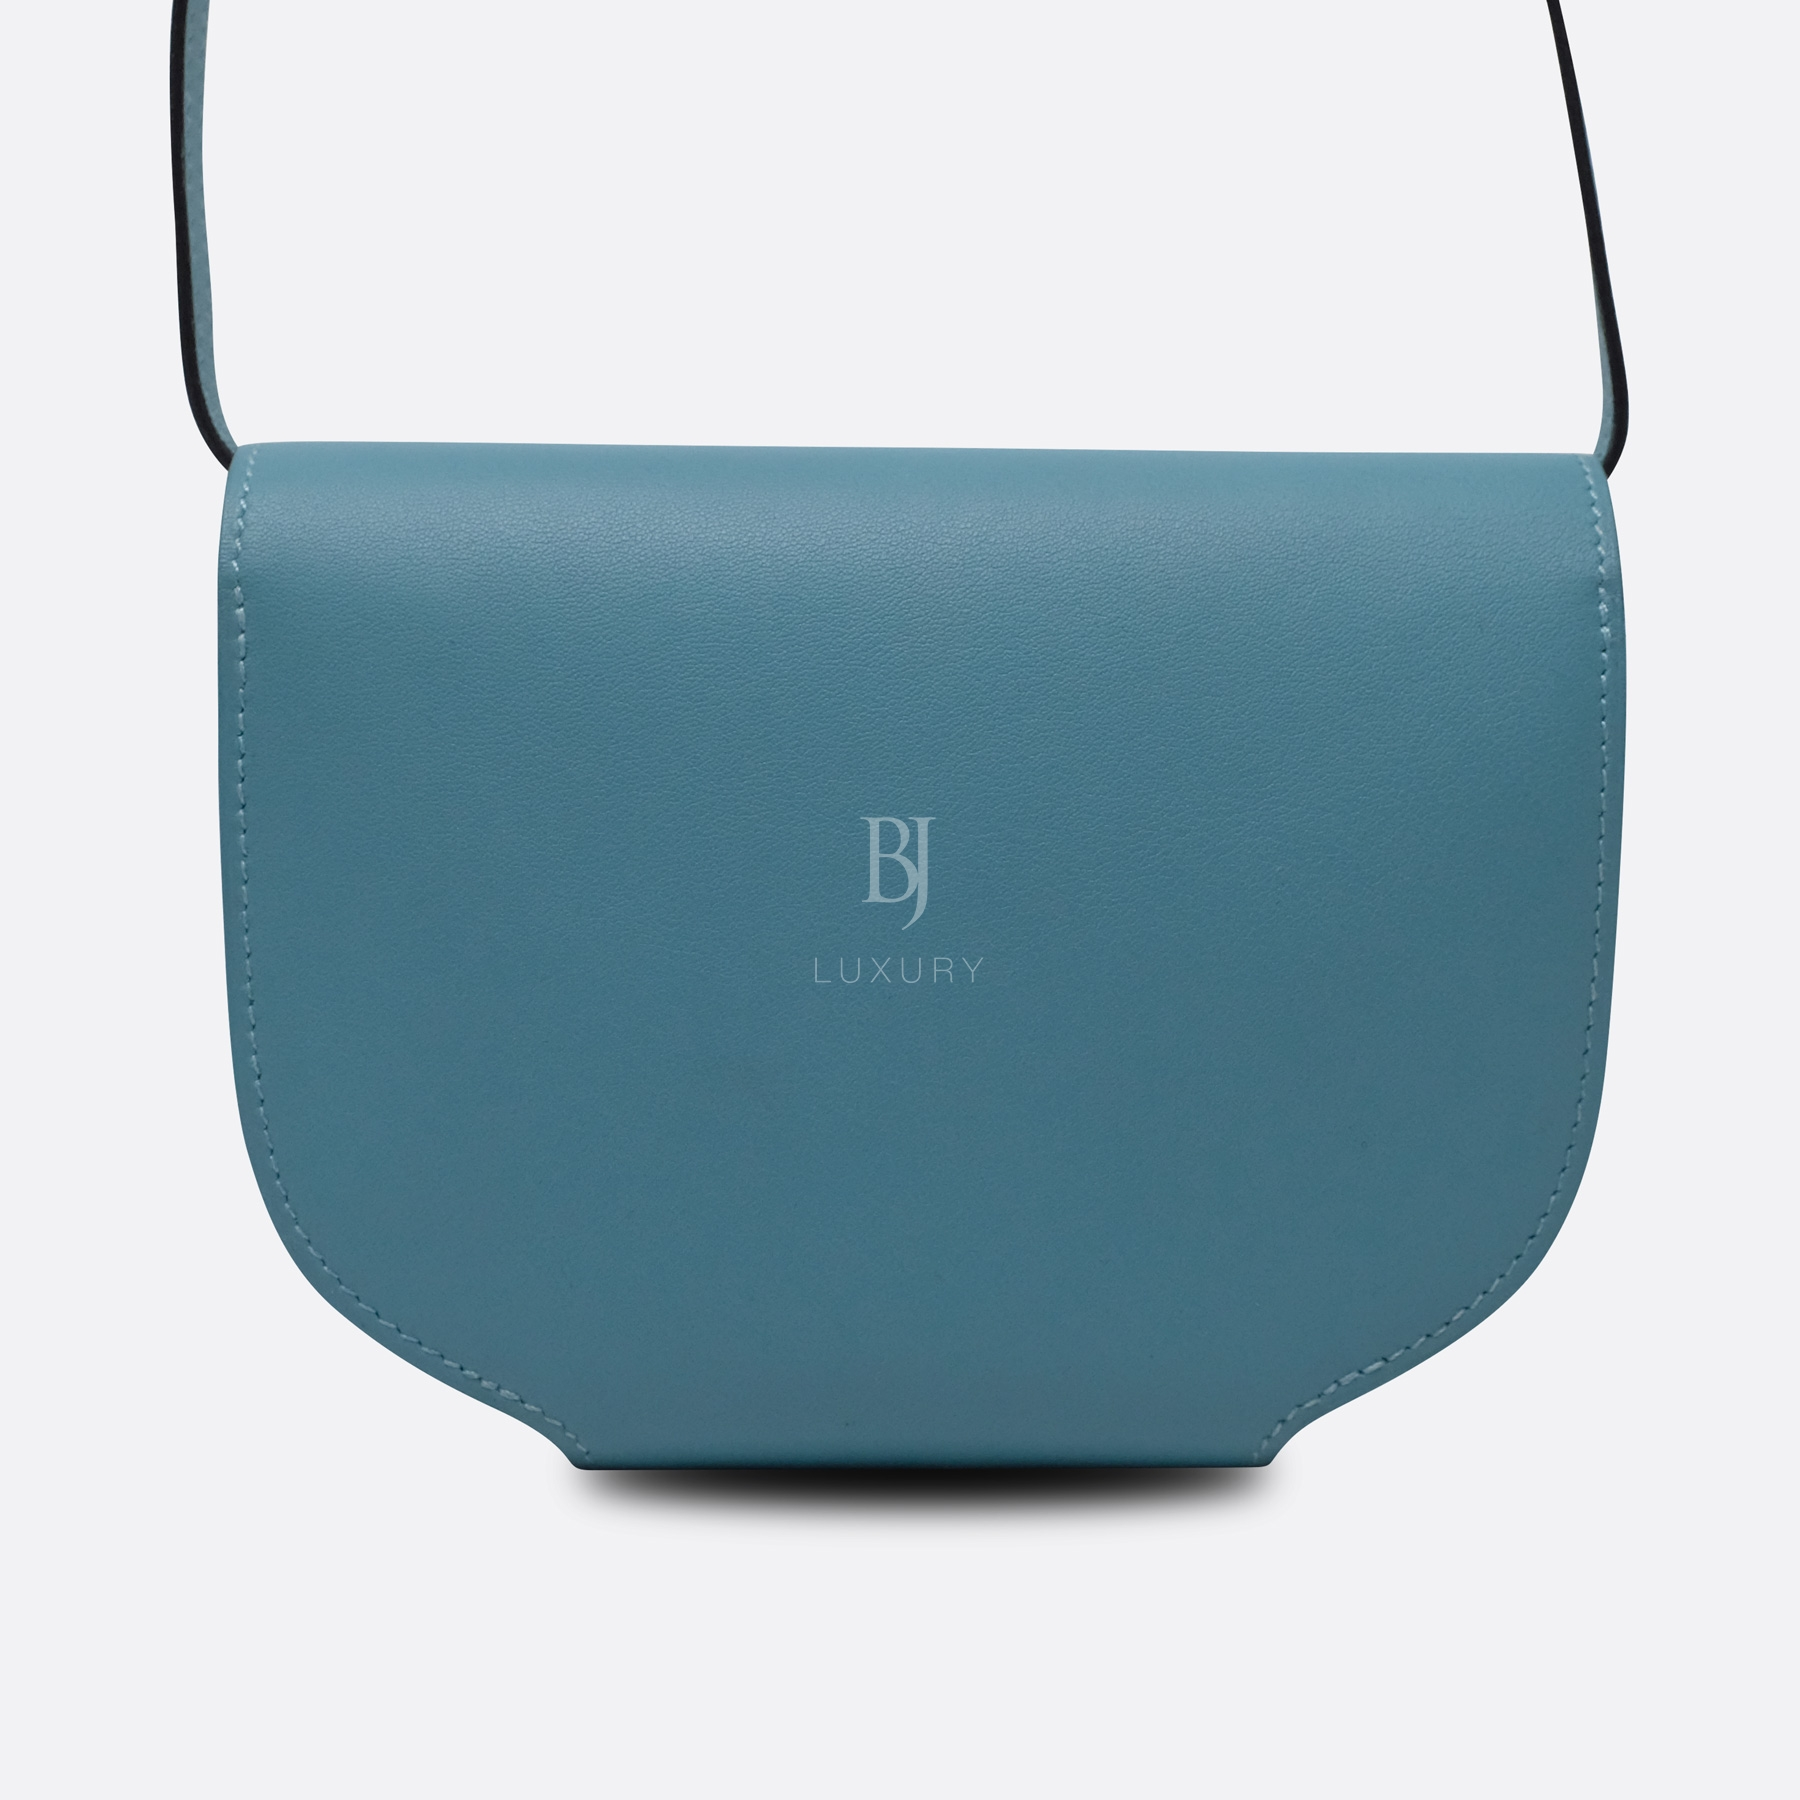 Hermes Conveyor Bag 16 Turquoise Swift Lizard Palladium BJ Luxury 5.jpg